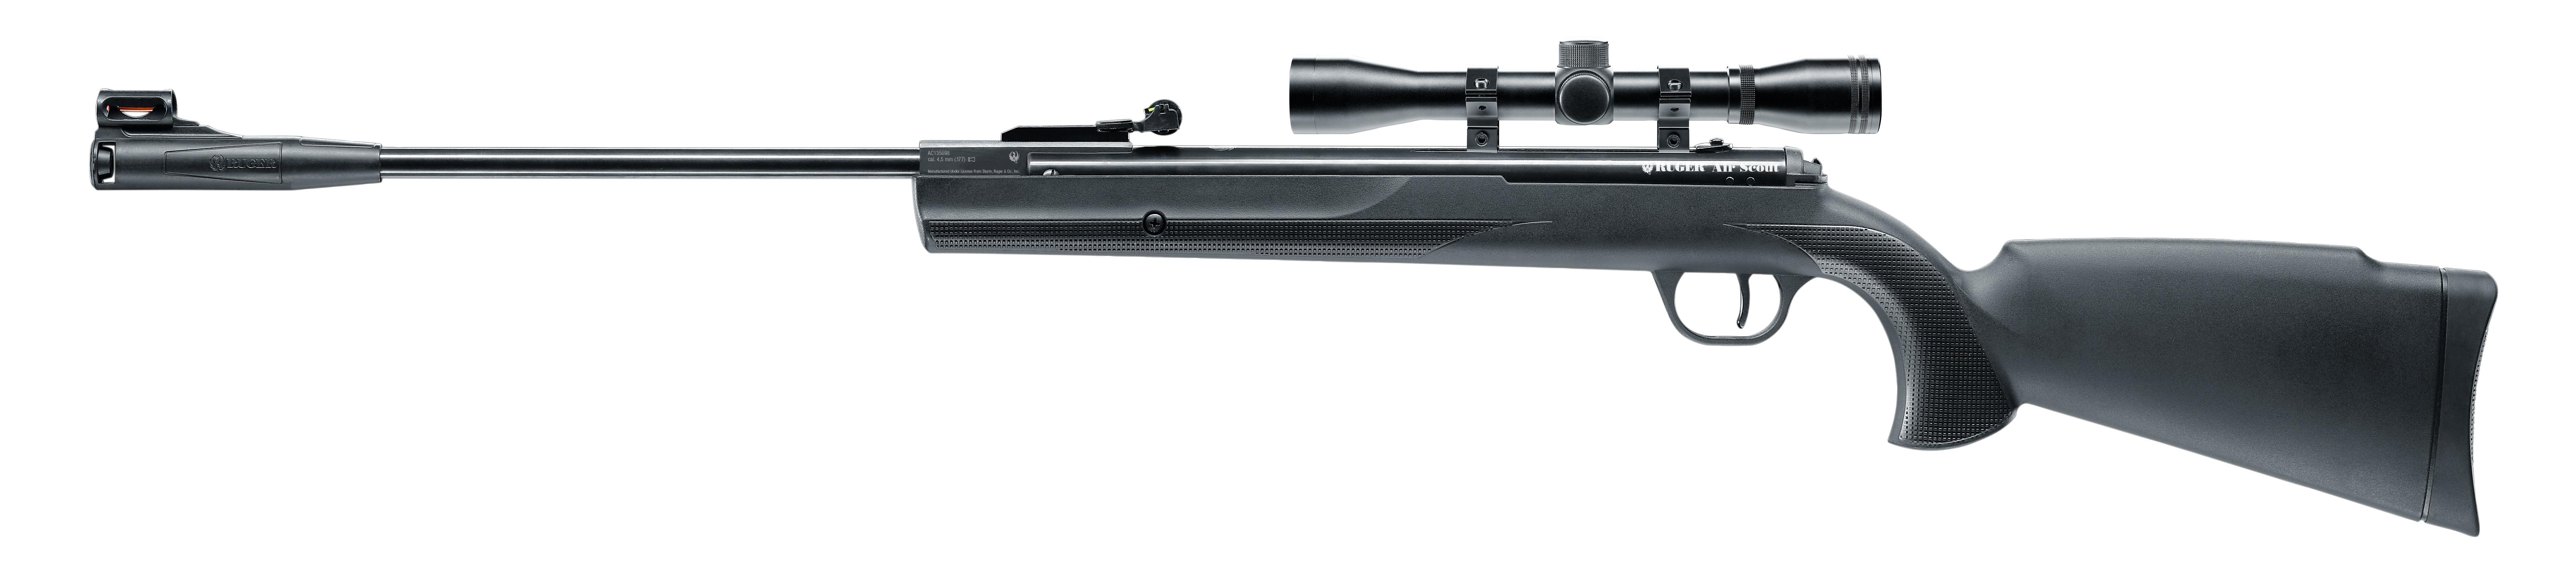 RUGER (Umarex) Spring Operated Airgun Air Scout Kit